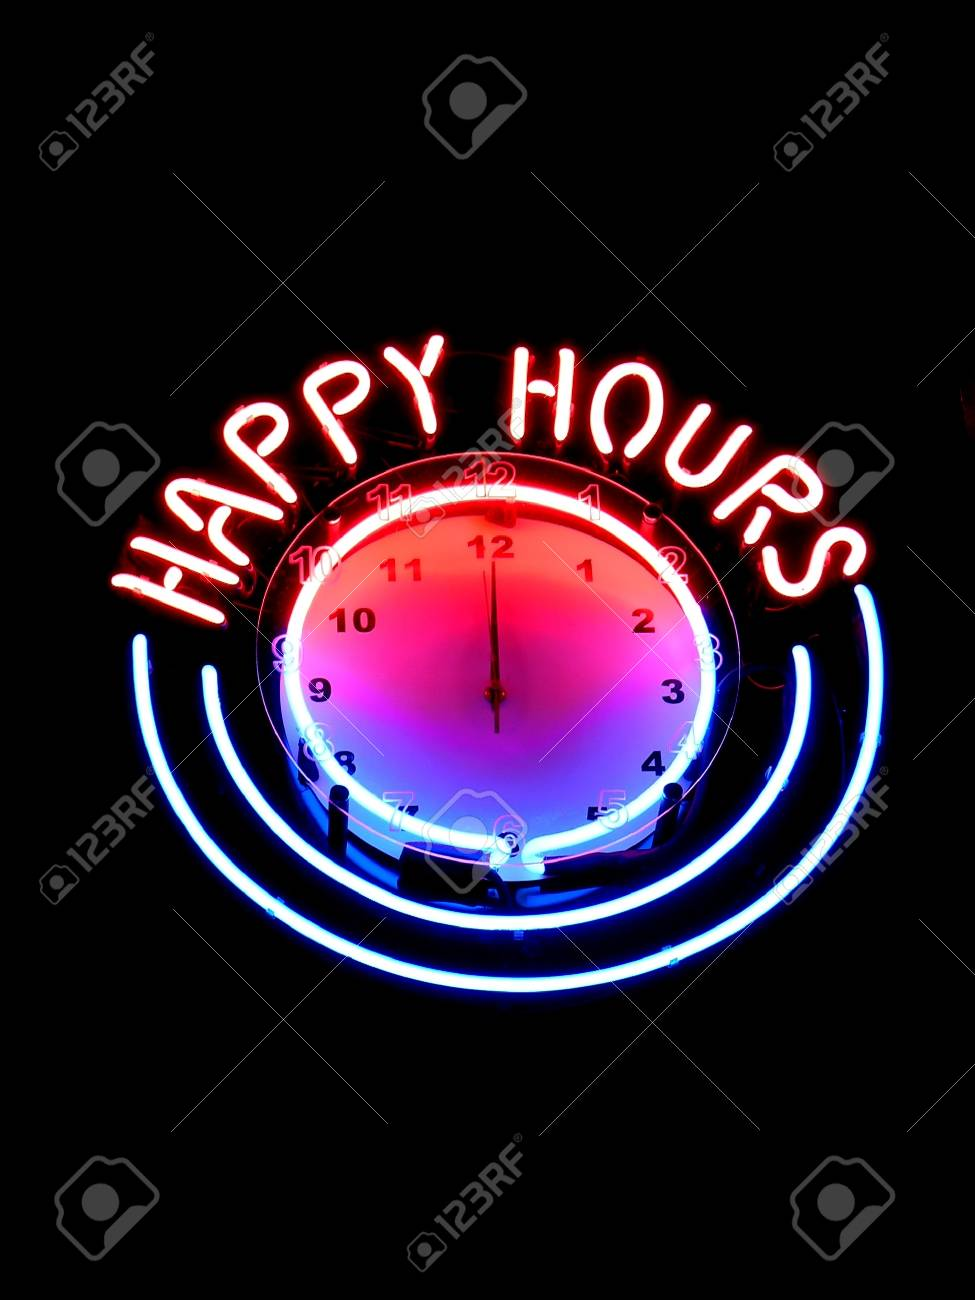 Happy hours clock in nightbar Stock Photo - 1637430